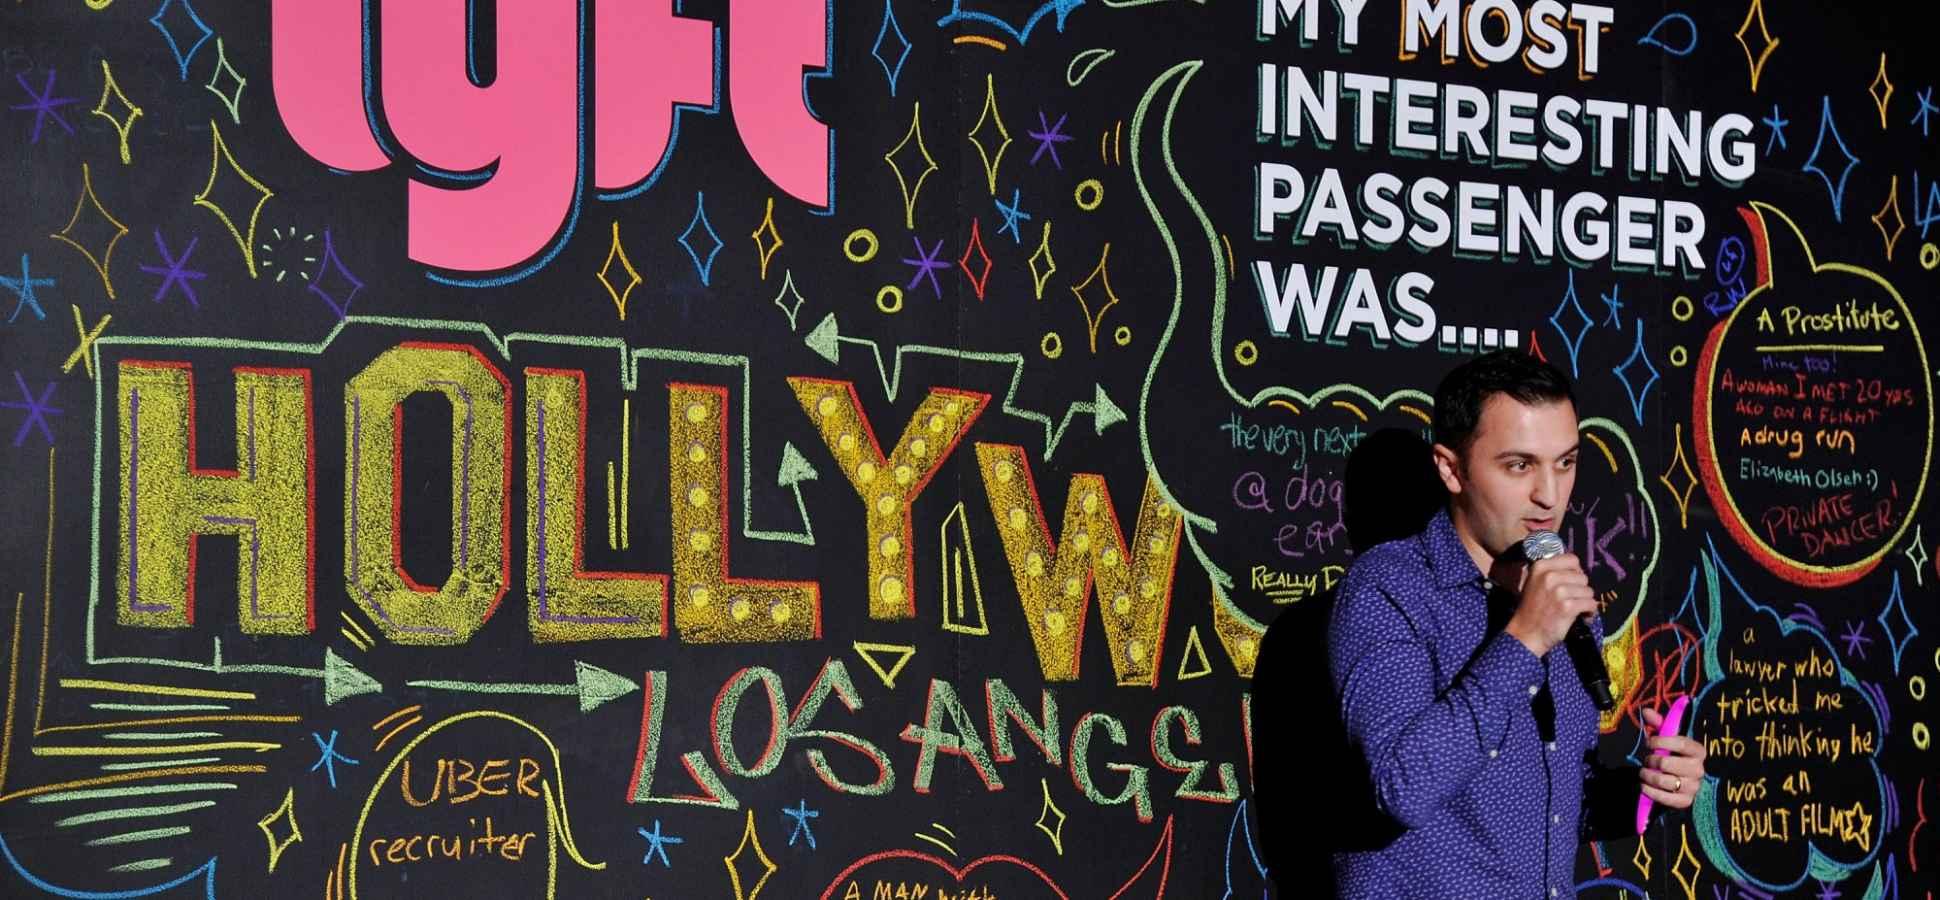 15 Surprising Facts About $5 5 Billion Rideshare Giant Lyft